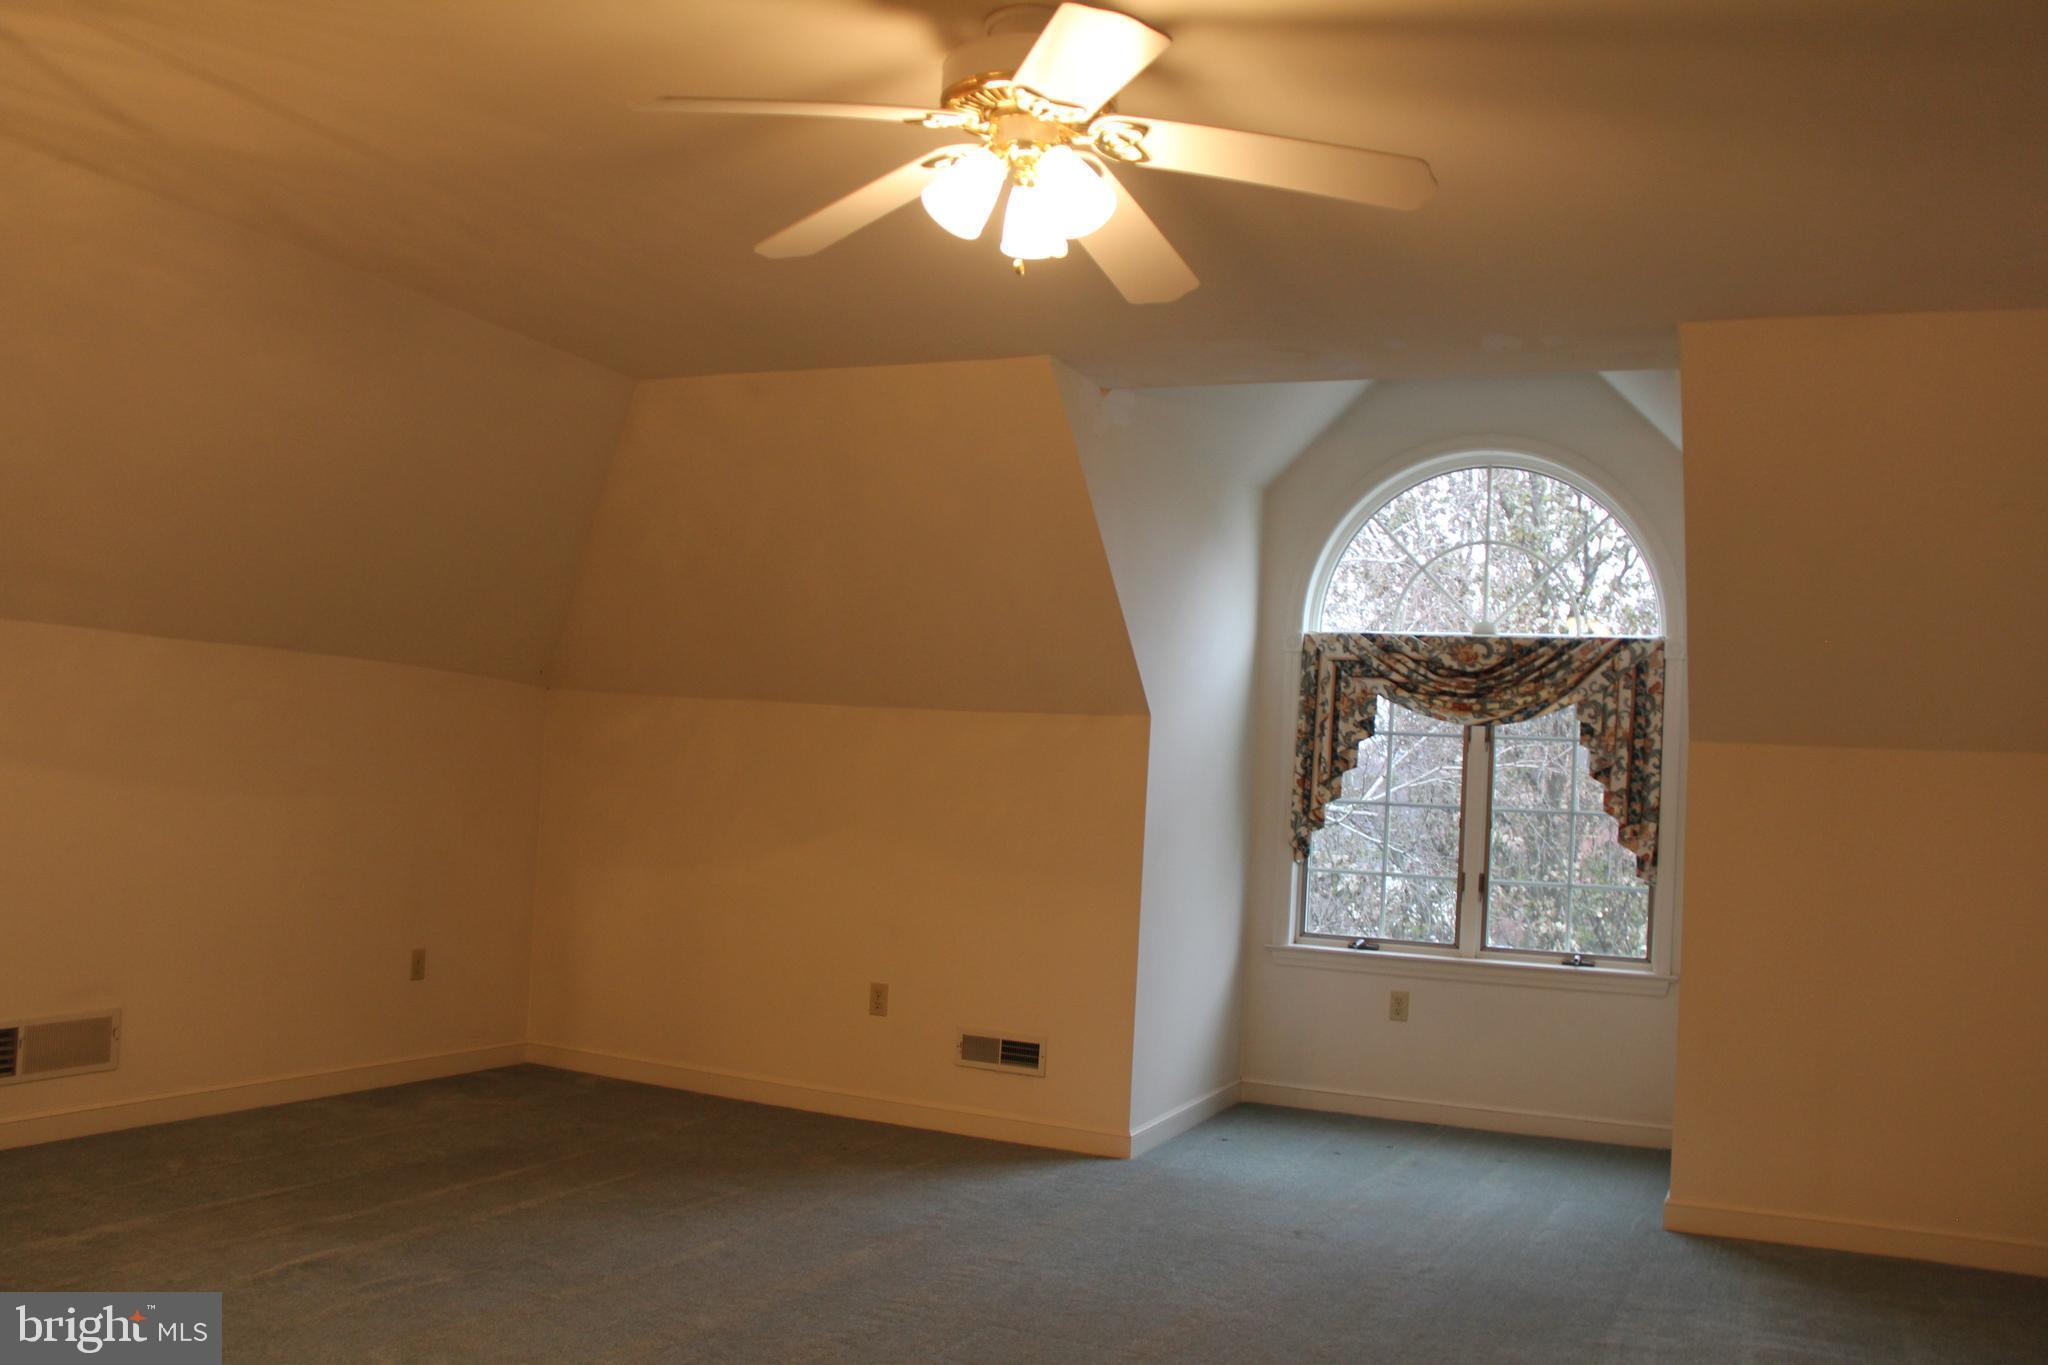 Living Area of Flex Room